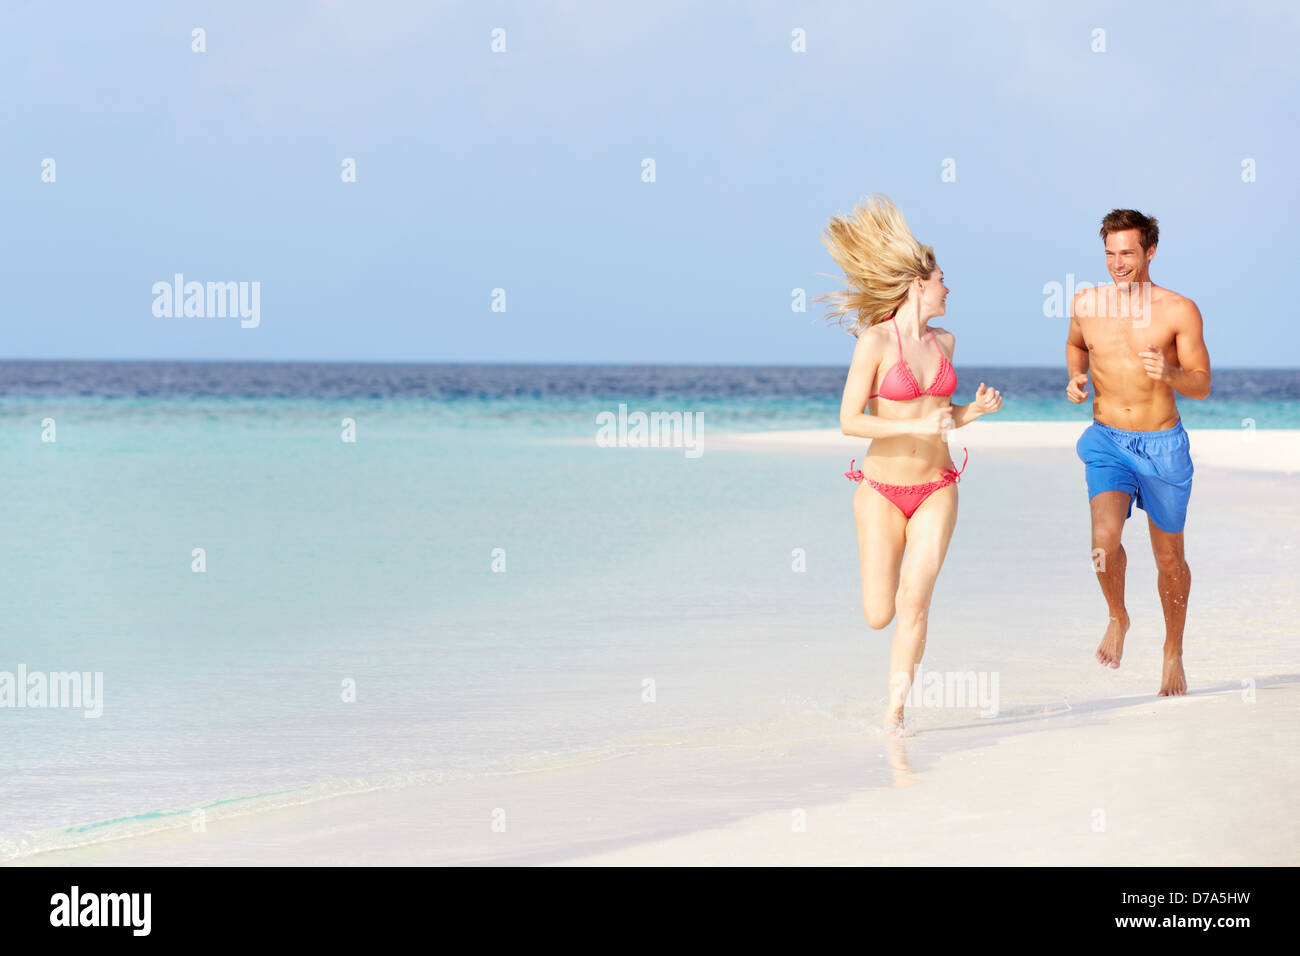 Romantic Couple Running On Beautiful Tropical Beach - Stock Image